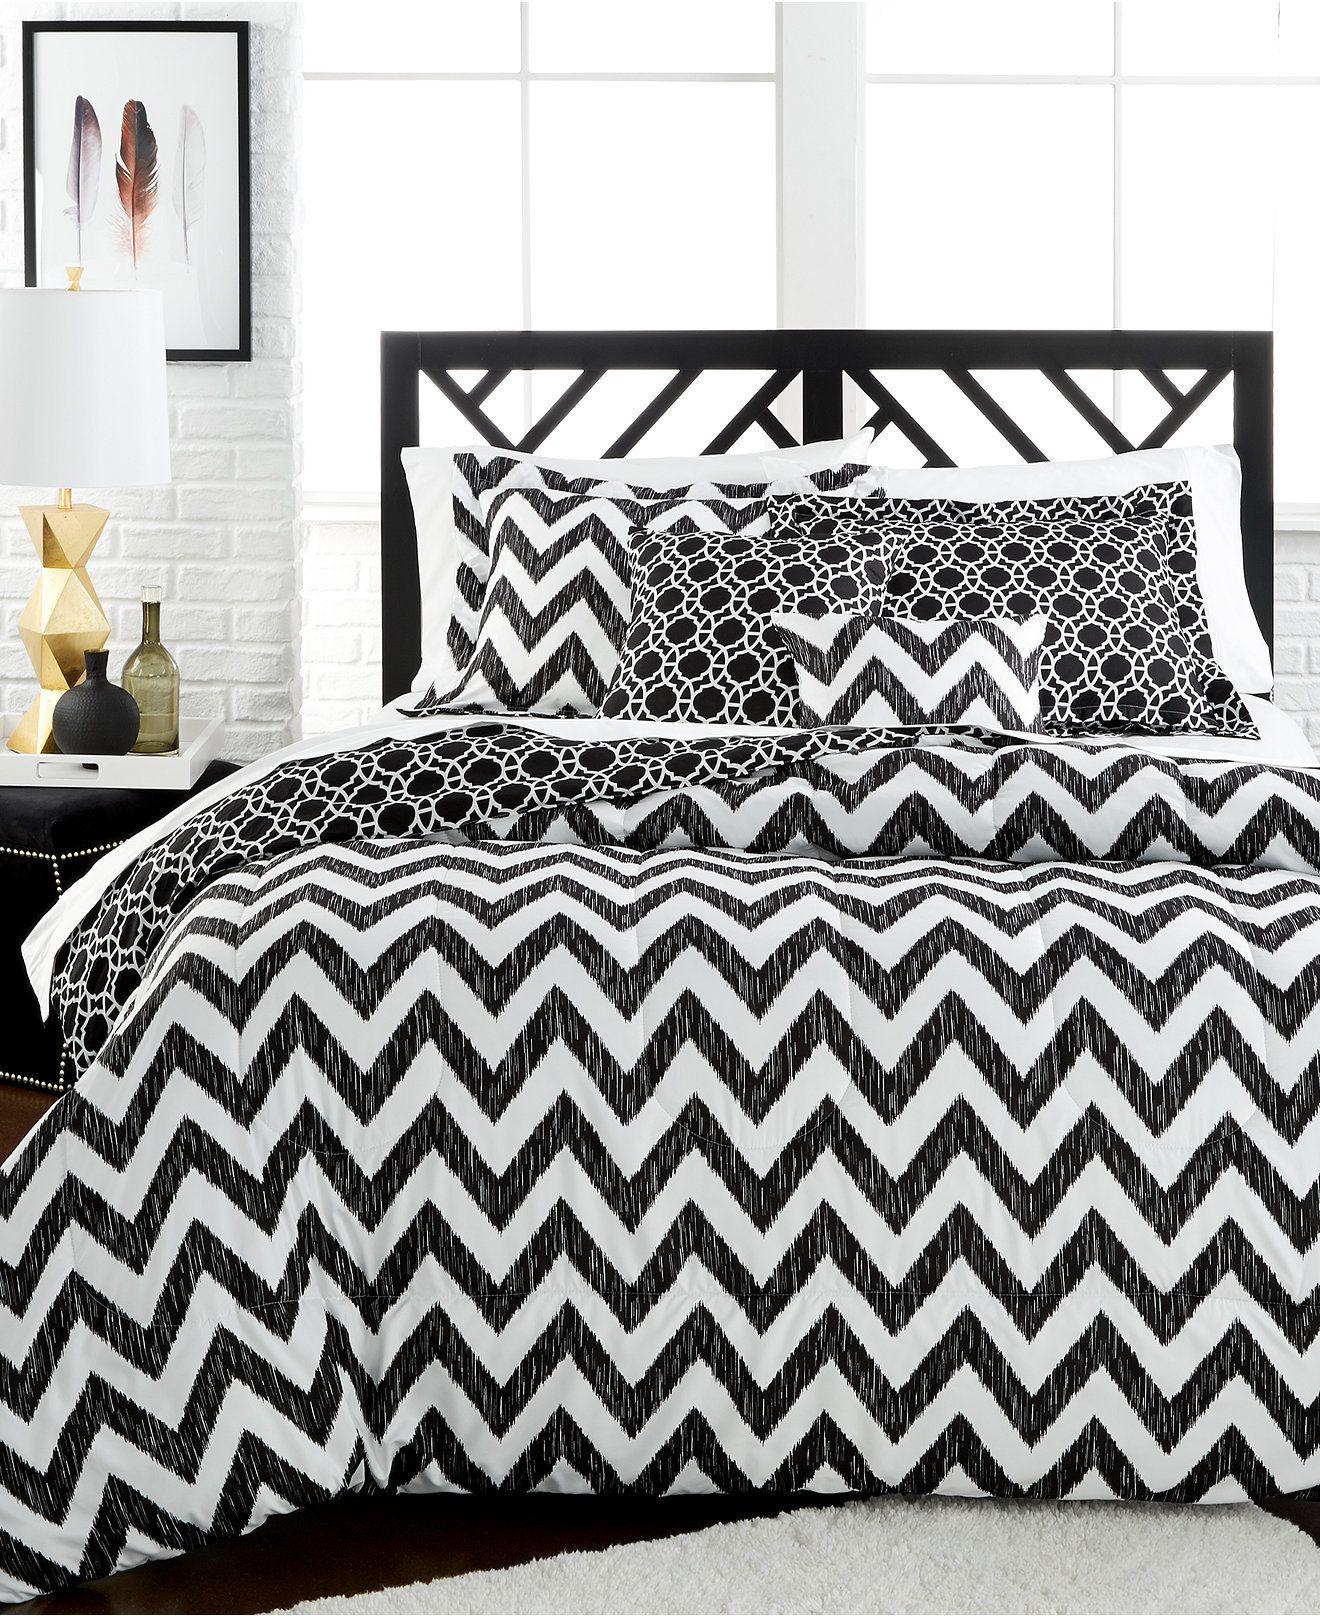 white for set houses and print piece zebra island brilliant staten the safari popular bed chevron rent queen black animal comforter